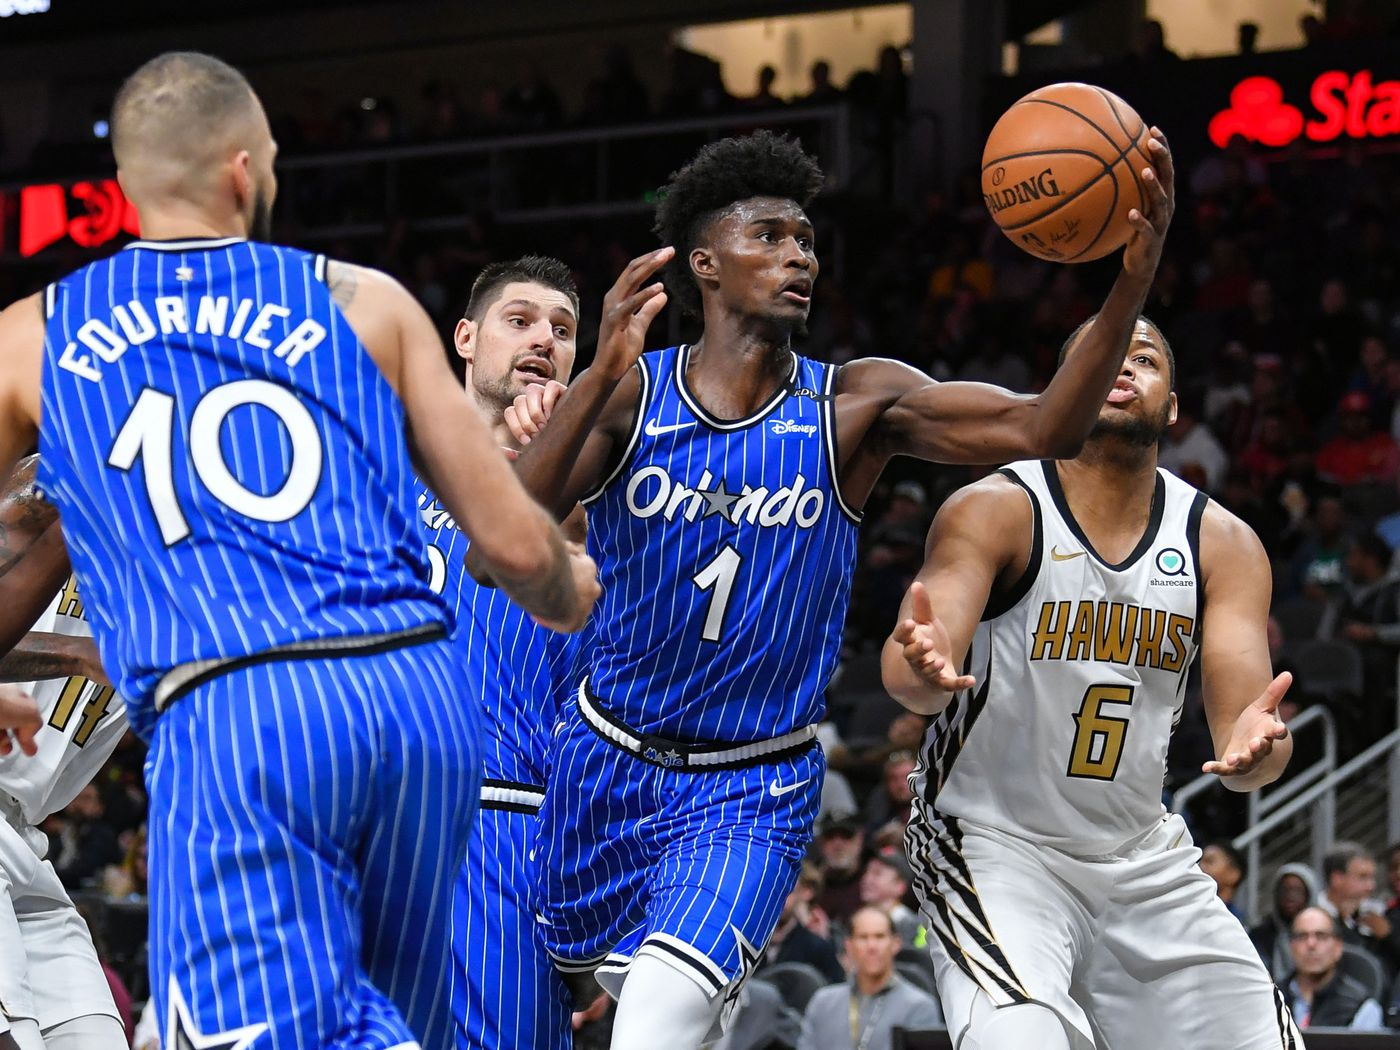 Brooklyn Nets Vs Orlando Magic Live Game Thread Watch Nets Vs Magic Live Netsdaily